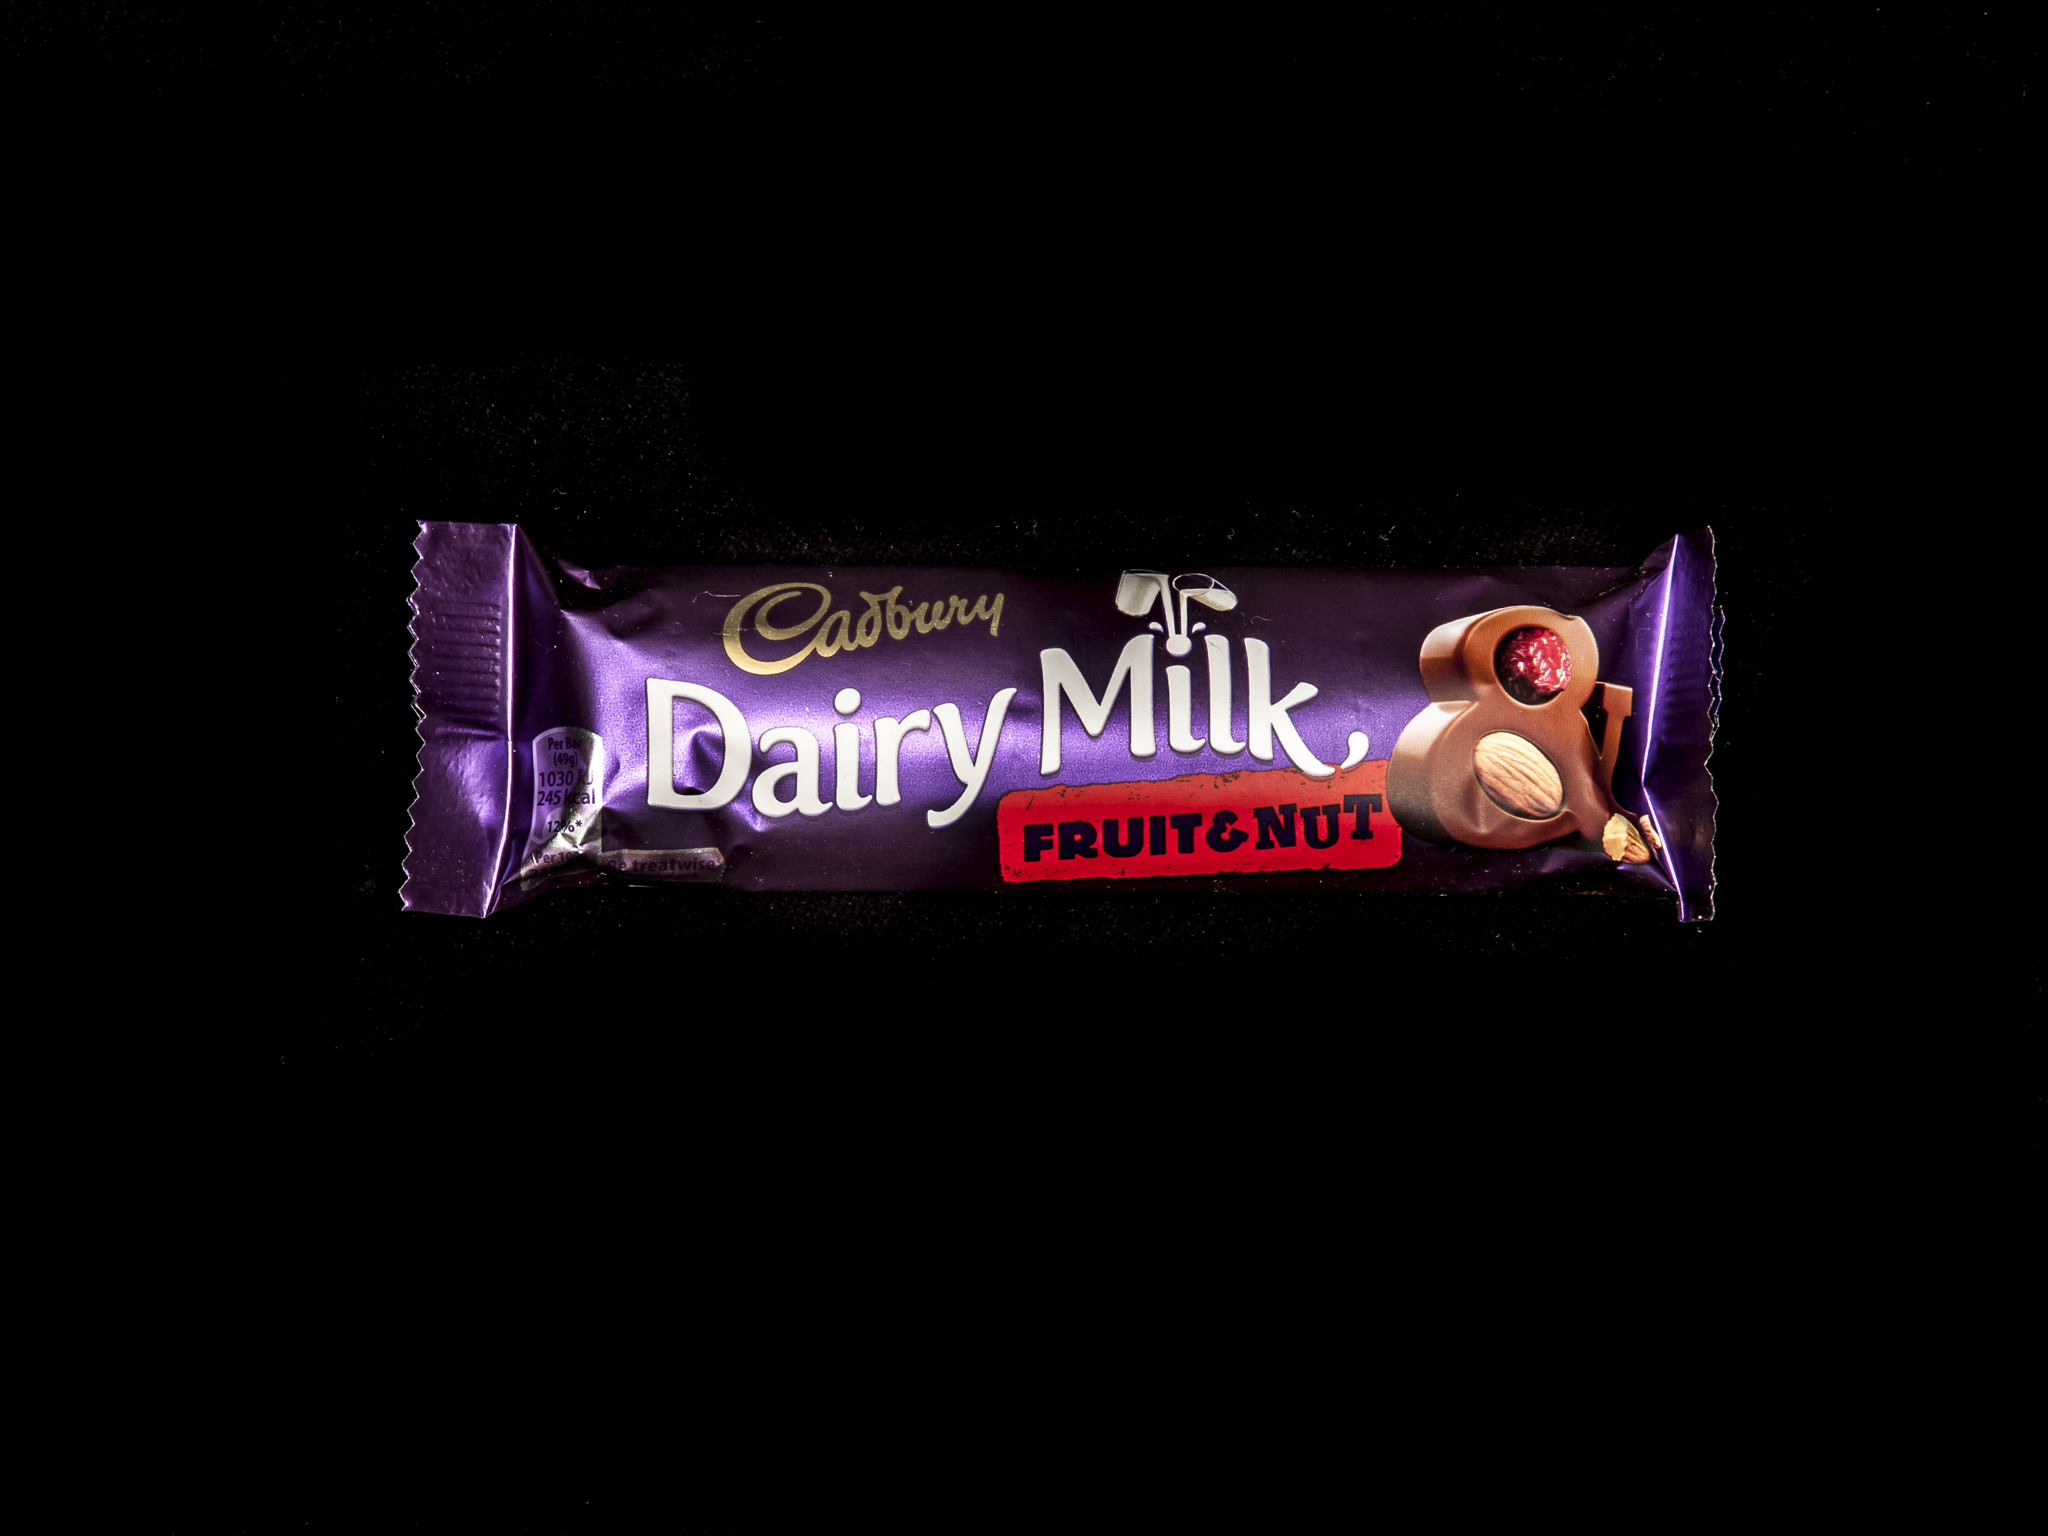 Cadbury's Fruit and Nut